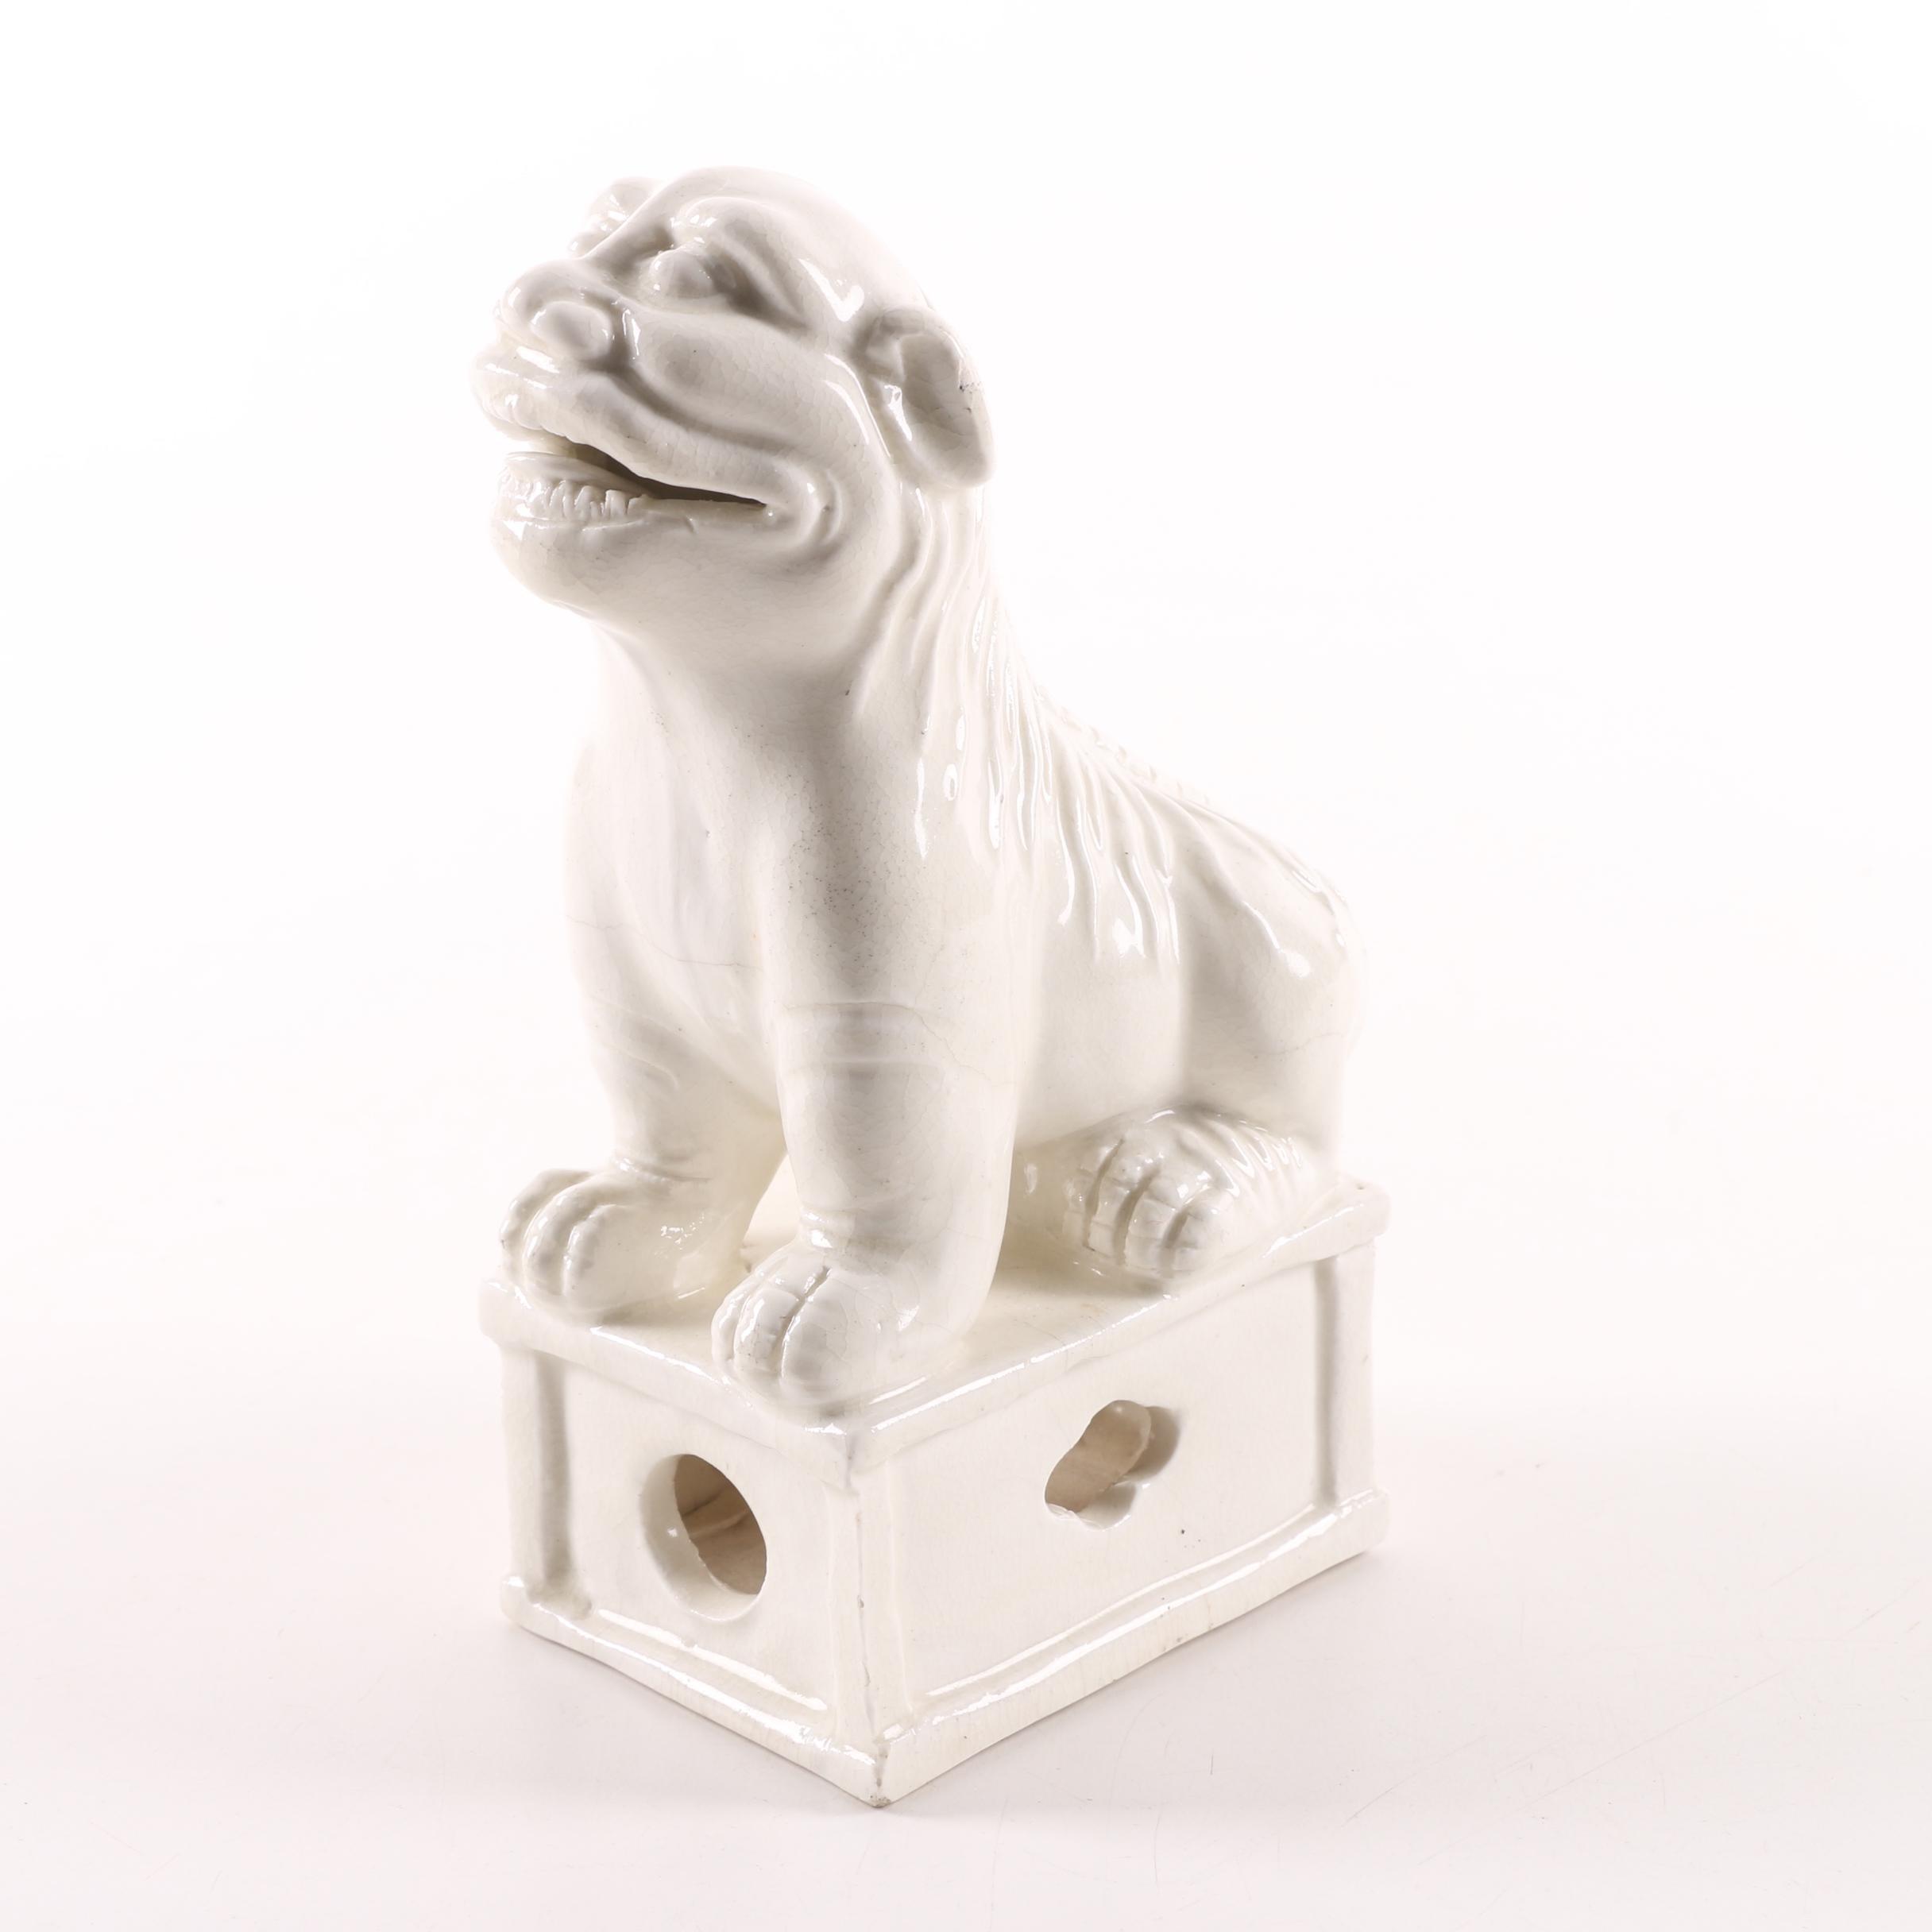 Chinese Guardian Lion Ceramic Figurine